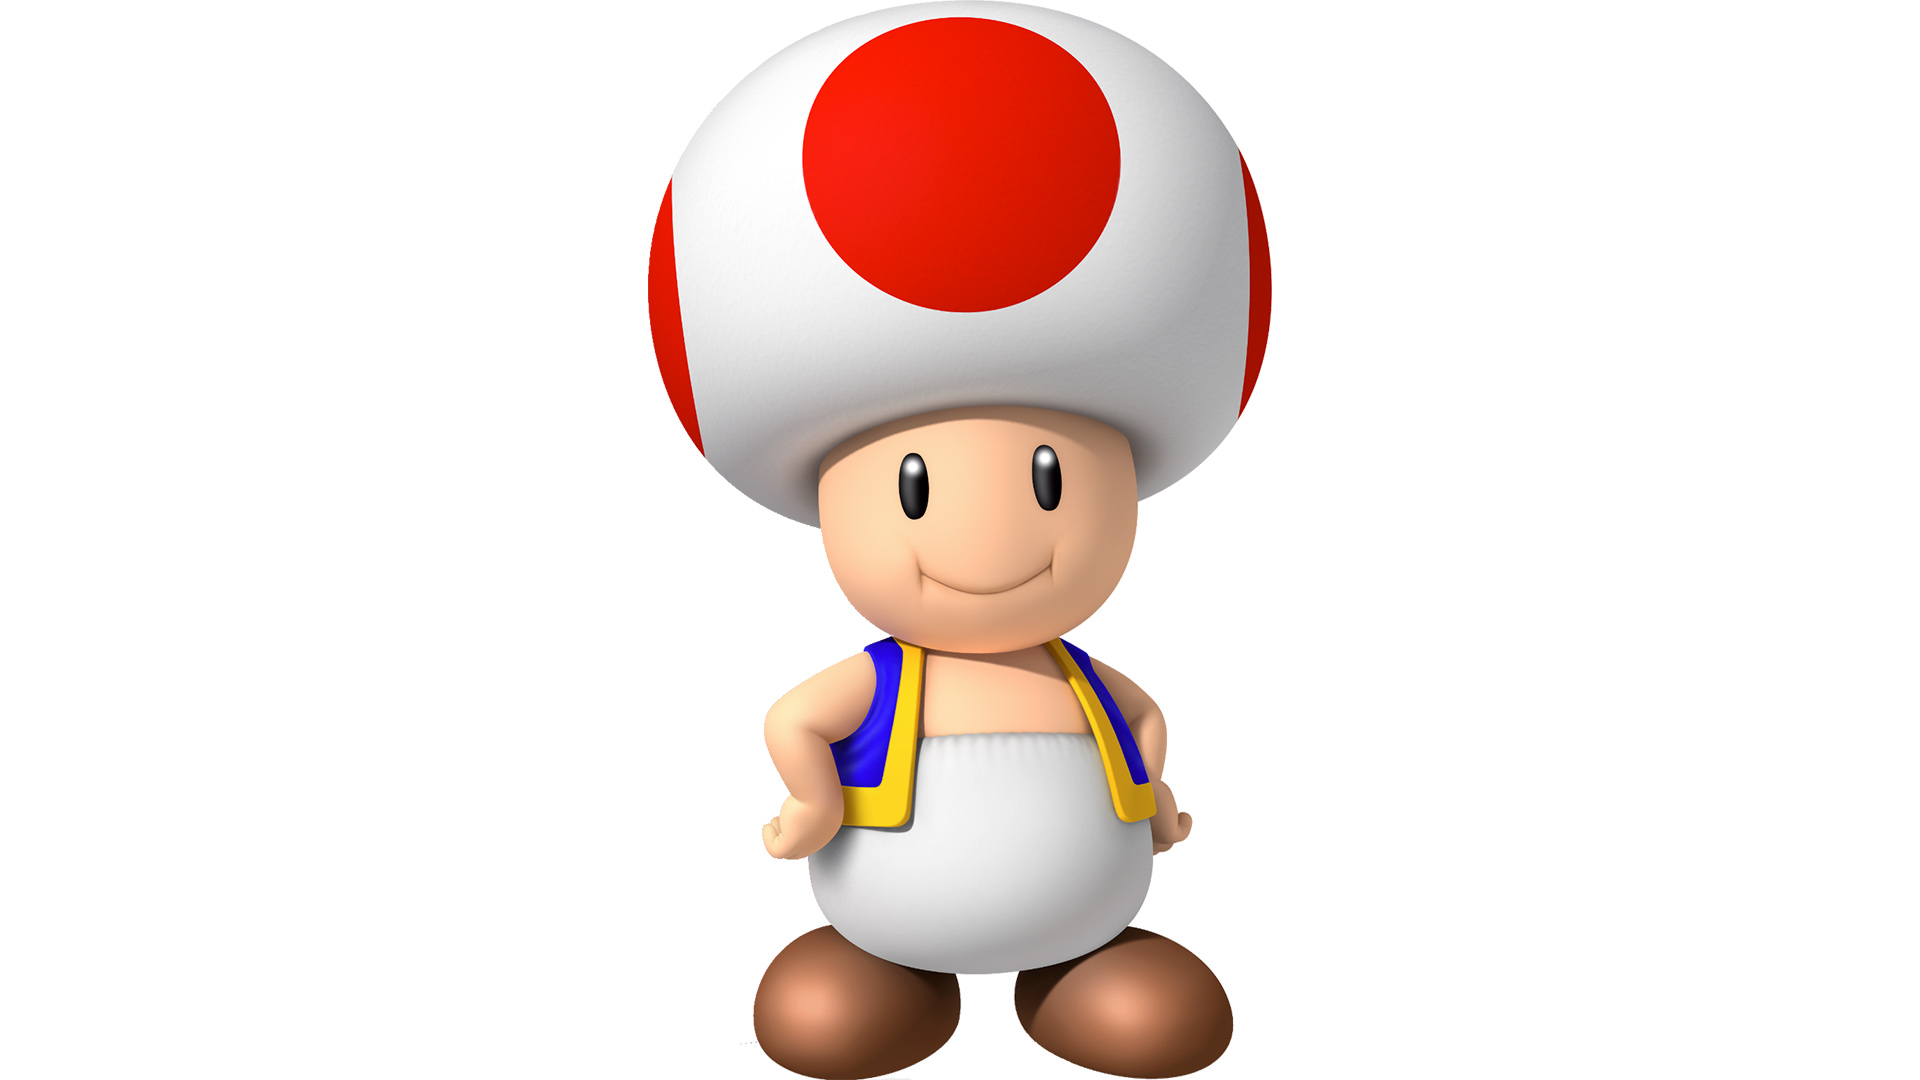 Toad isn't wearing a hat, Nintendo confirms screenshot